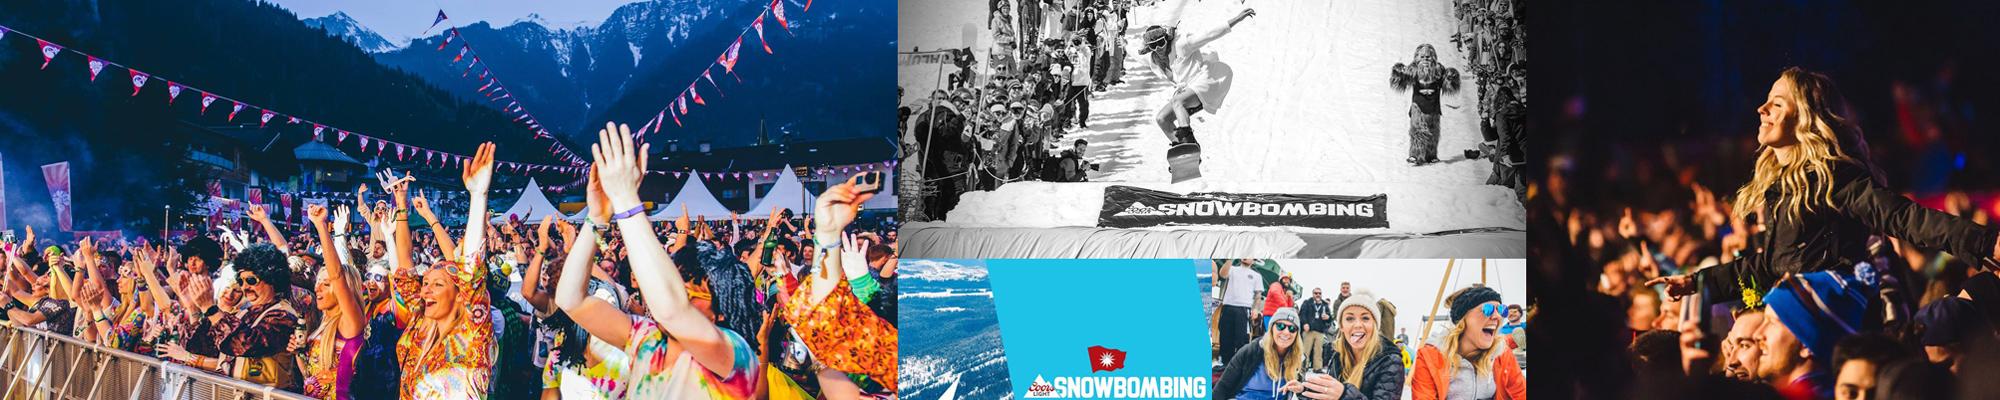 Festival musicali Canada: Snowbombing Festival